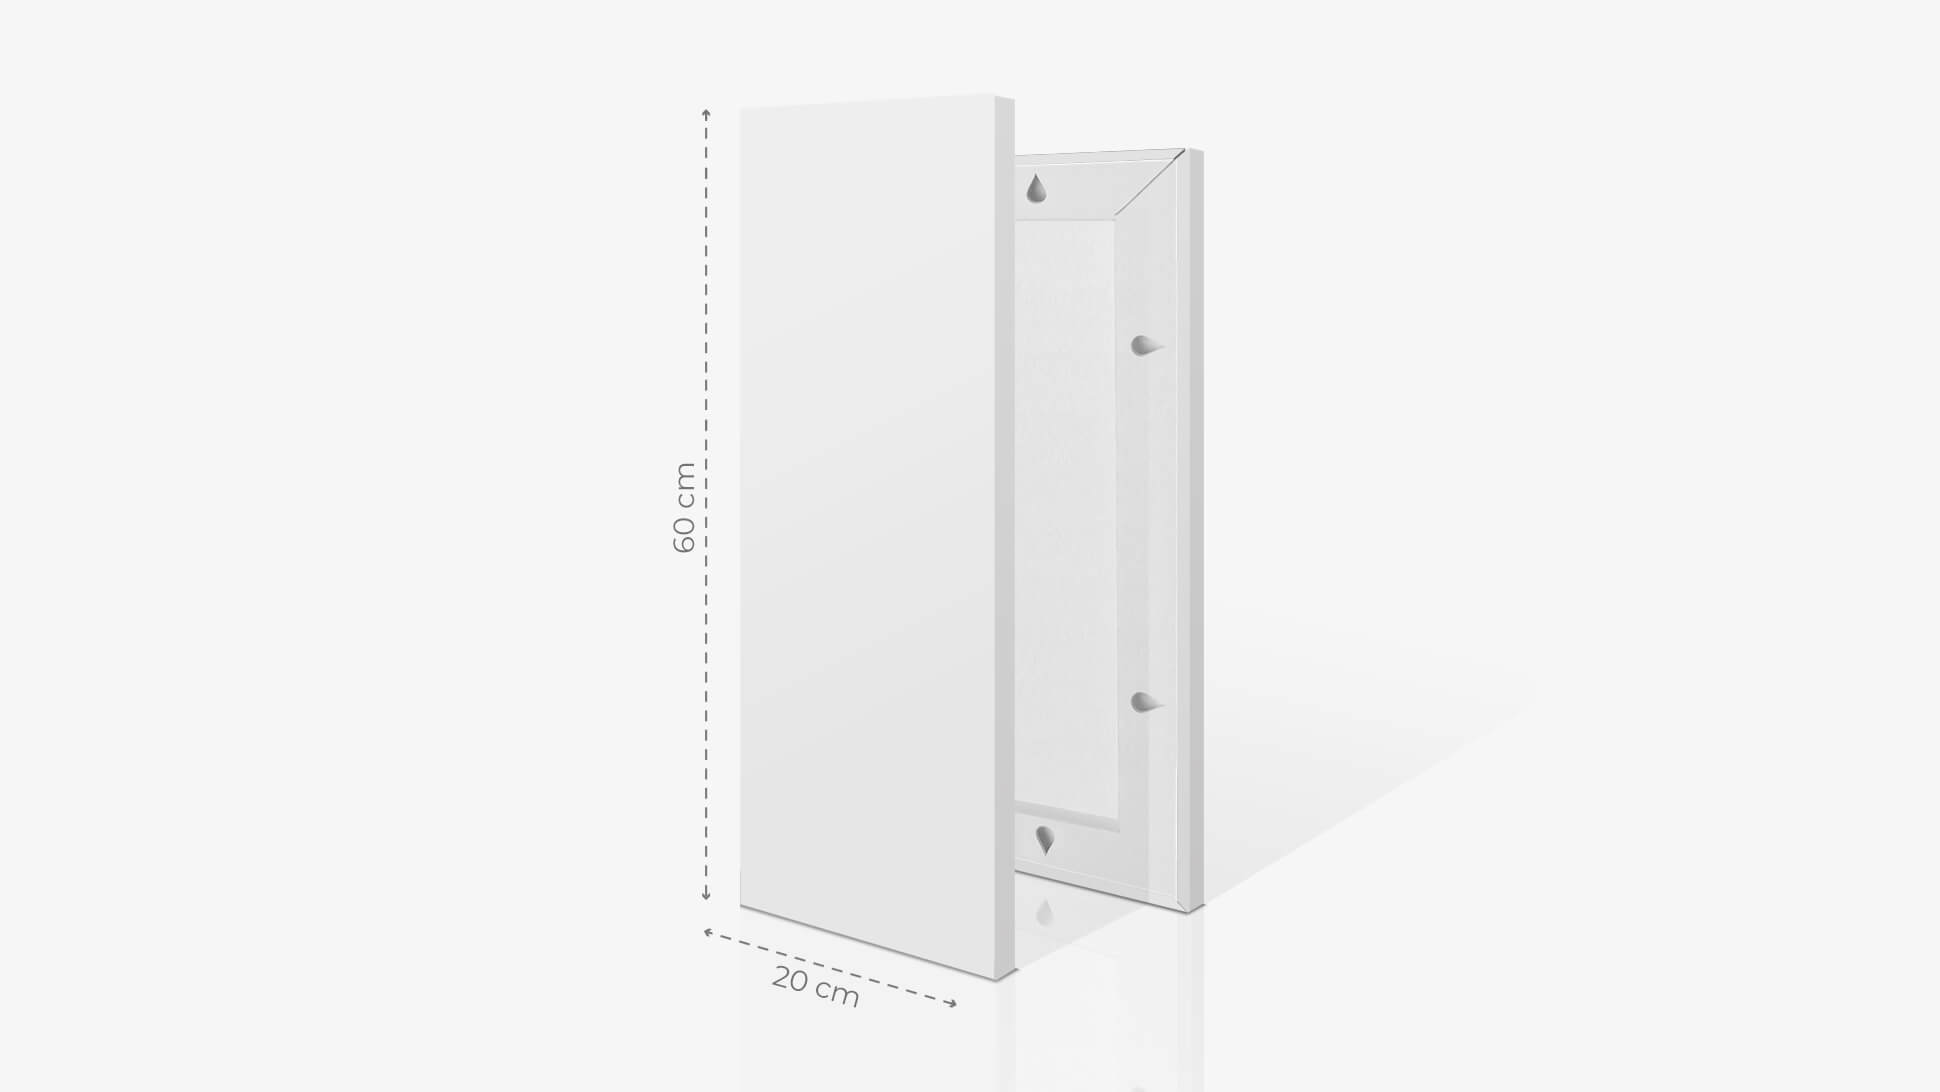 Fotoquadro 20x60 cm | tictac.it